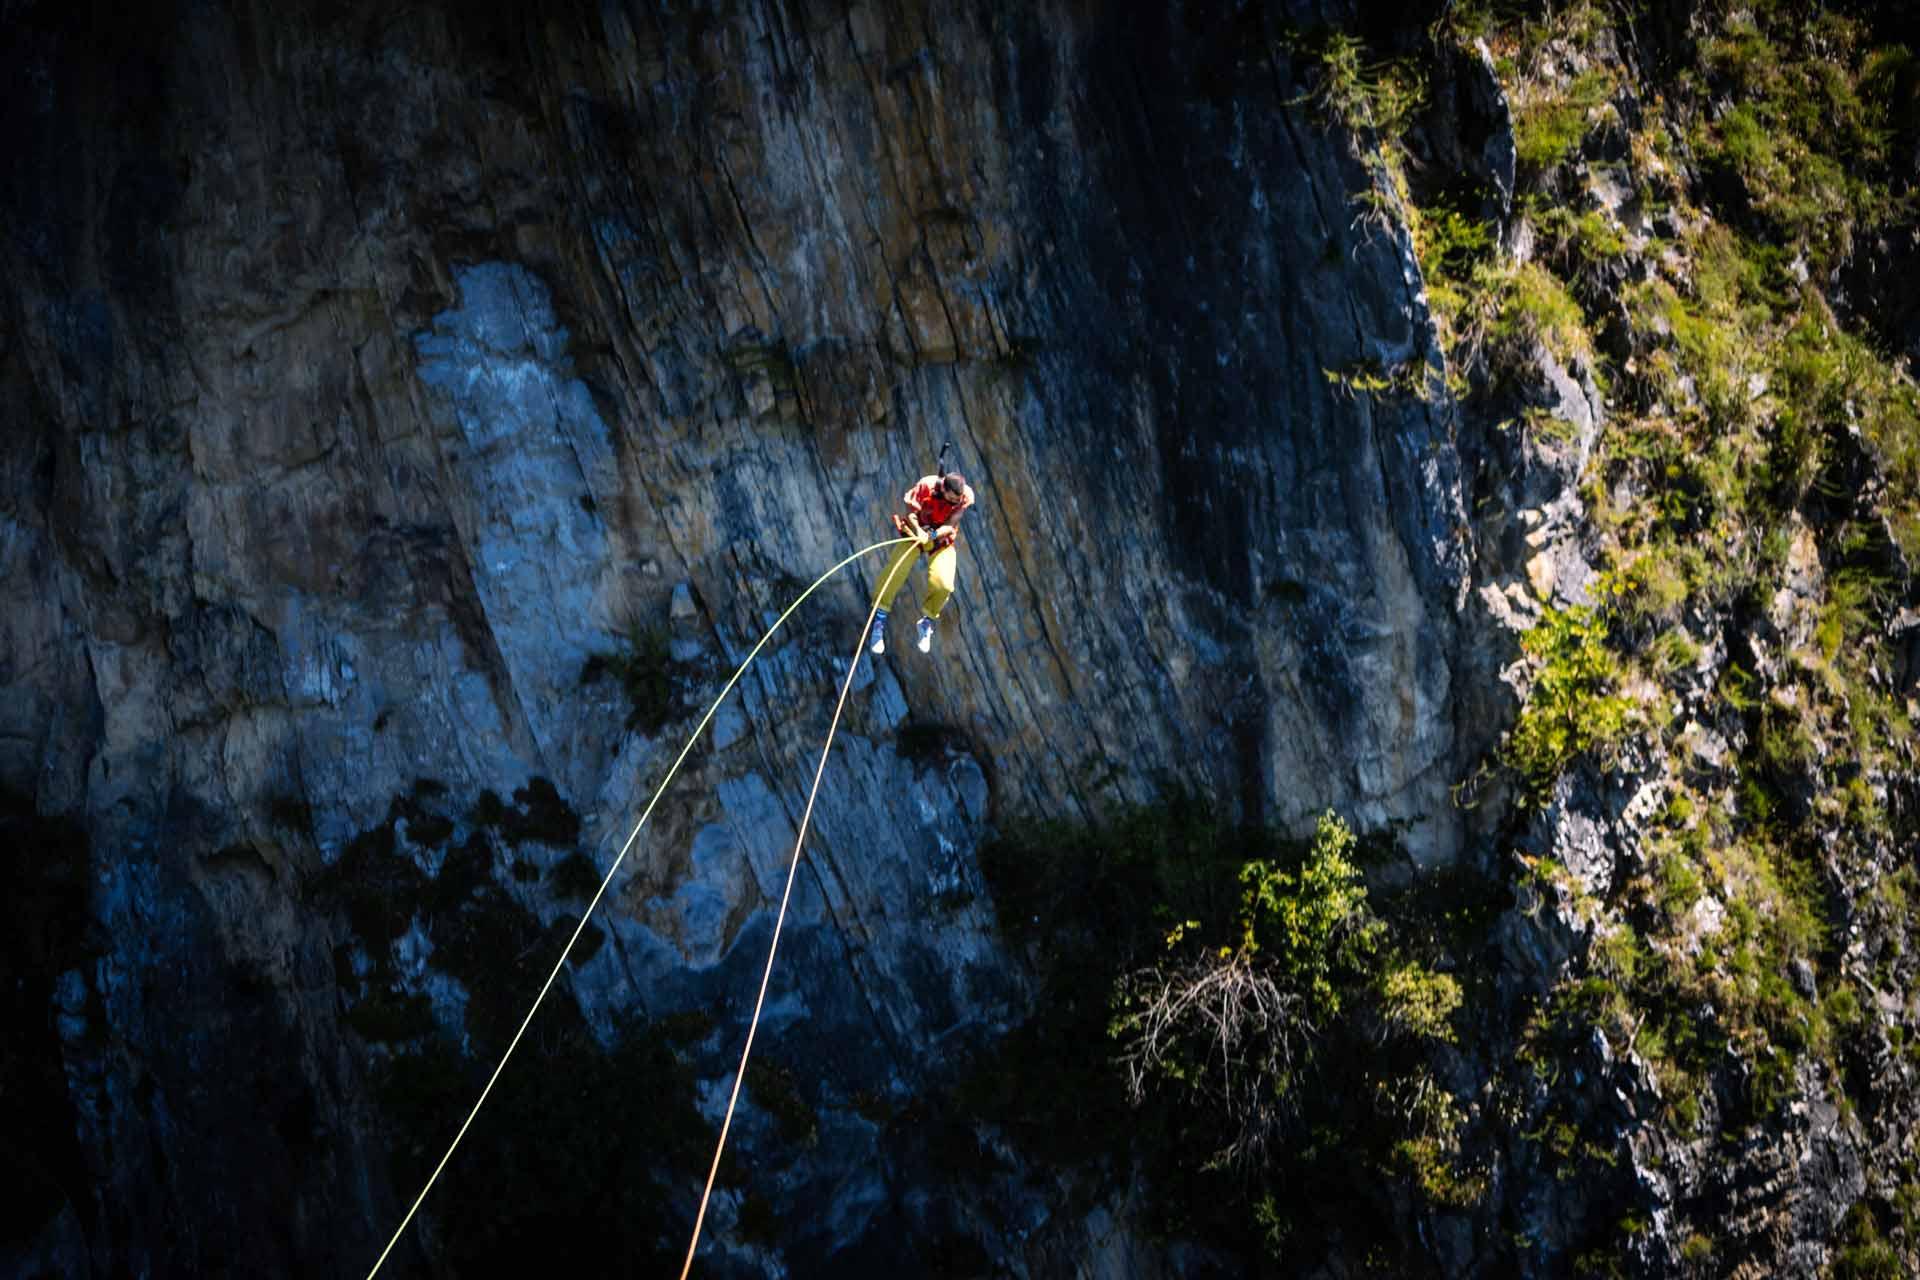 45 metres of free fall